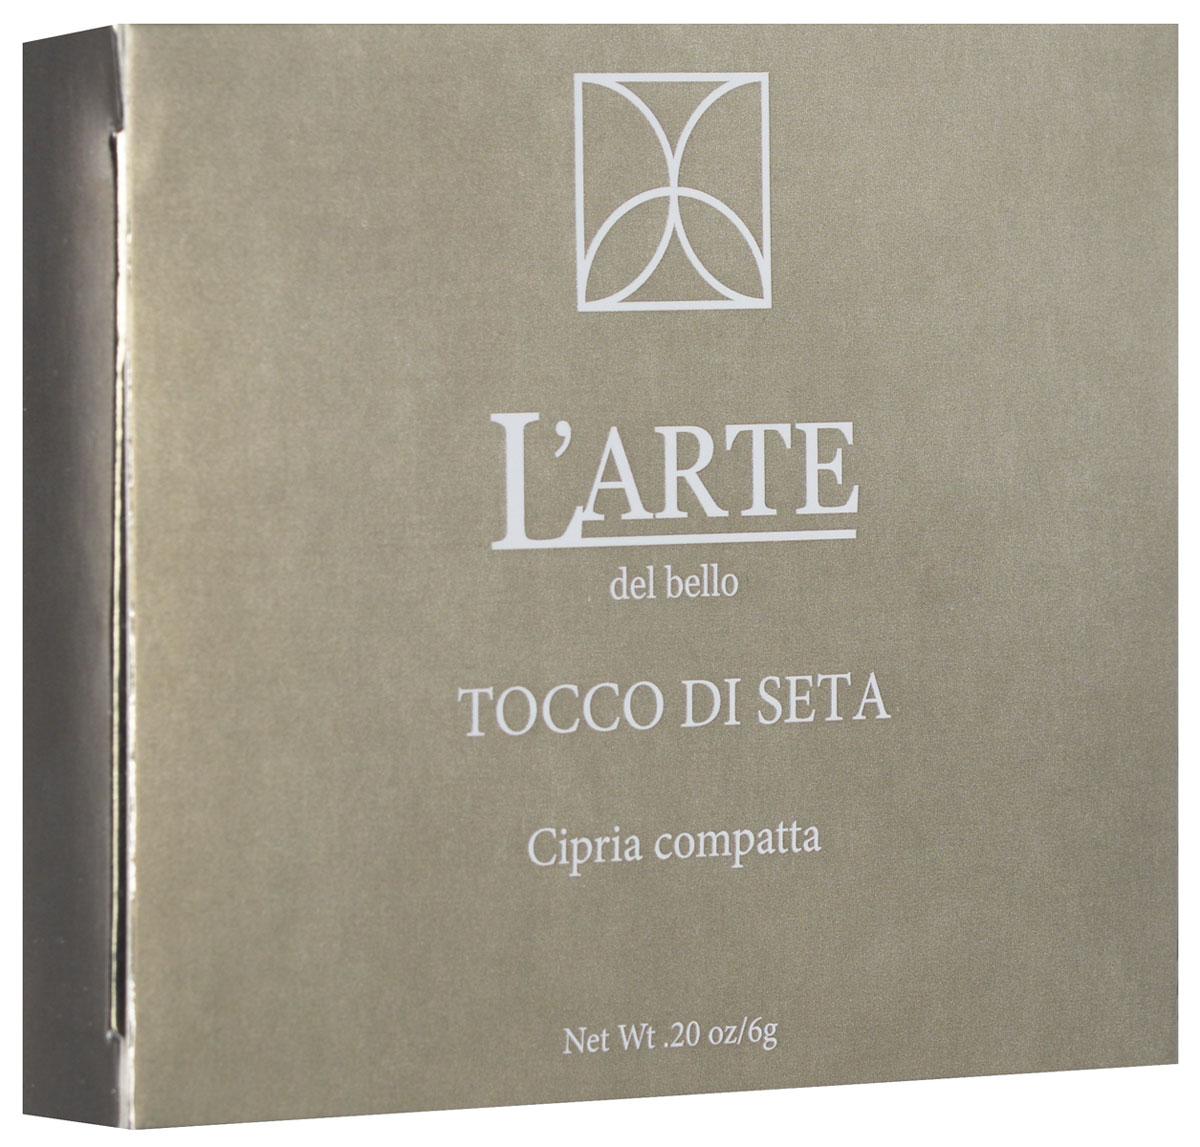 Larte del bello Пудра Tocco di Seta, компактная, тон 04 Светлый, 6 г